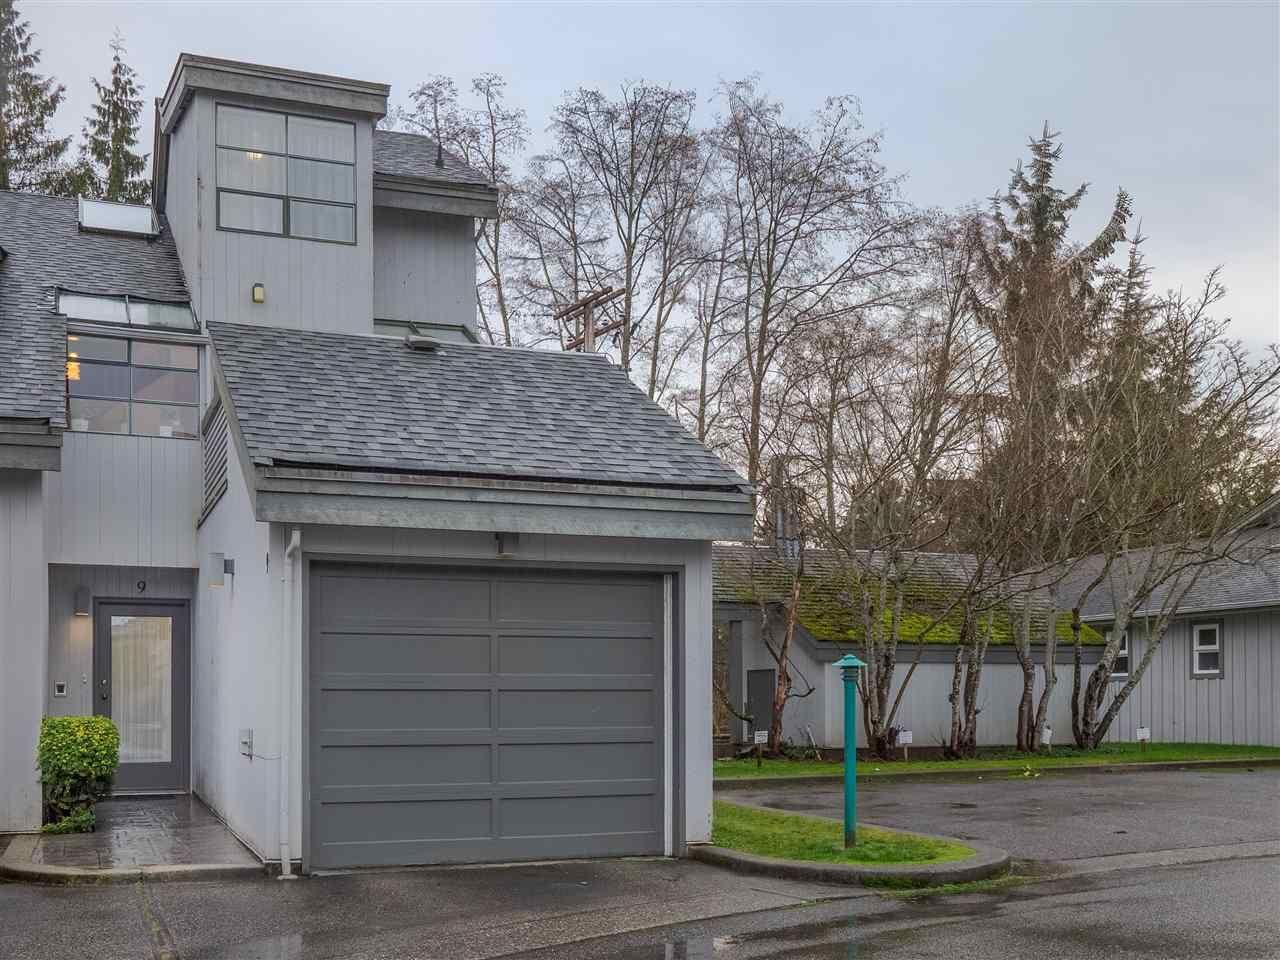 Main Photo: 9 5753 WHARF Avenue in Sechelt: Sechelt District Townhouse for sale (Sunshine Coast)  : MLS®# R2522010